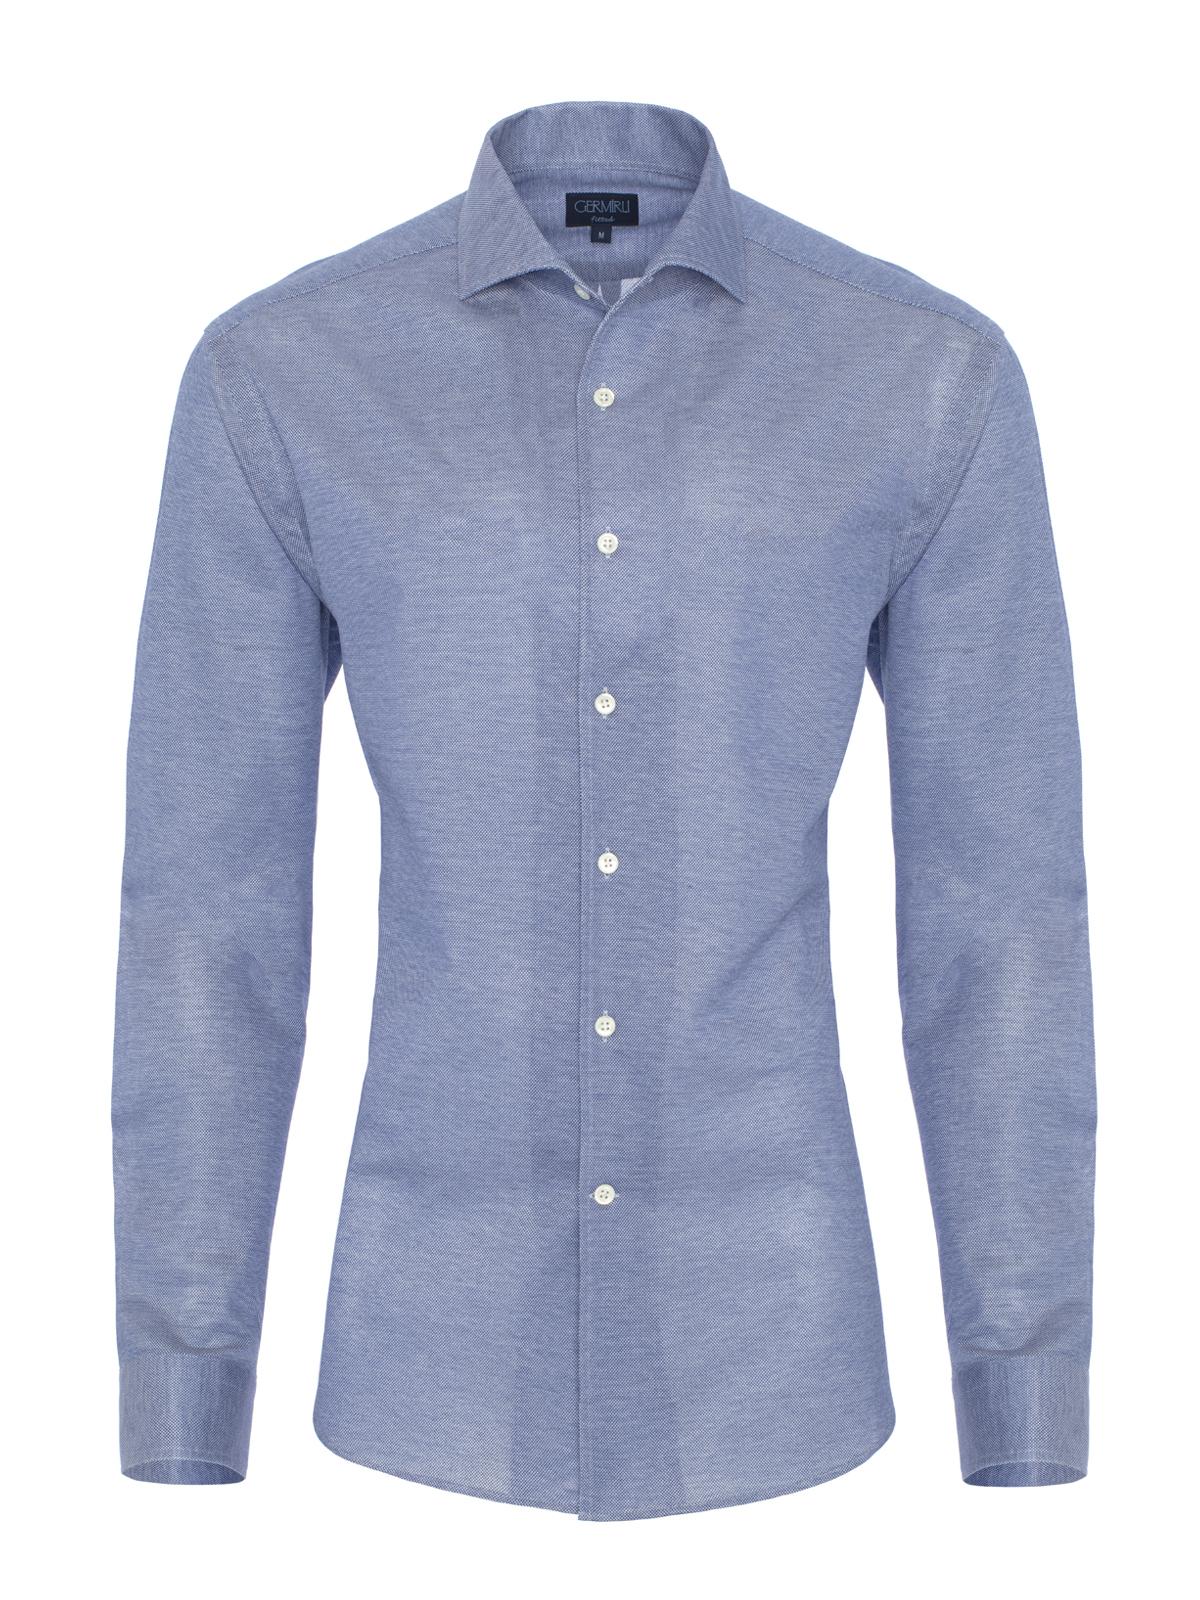 Germirli Nevapaş Spread Collar Piquet Knitted Slim Fit Shirt